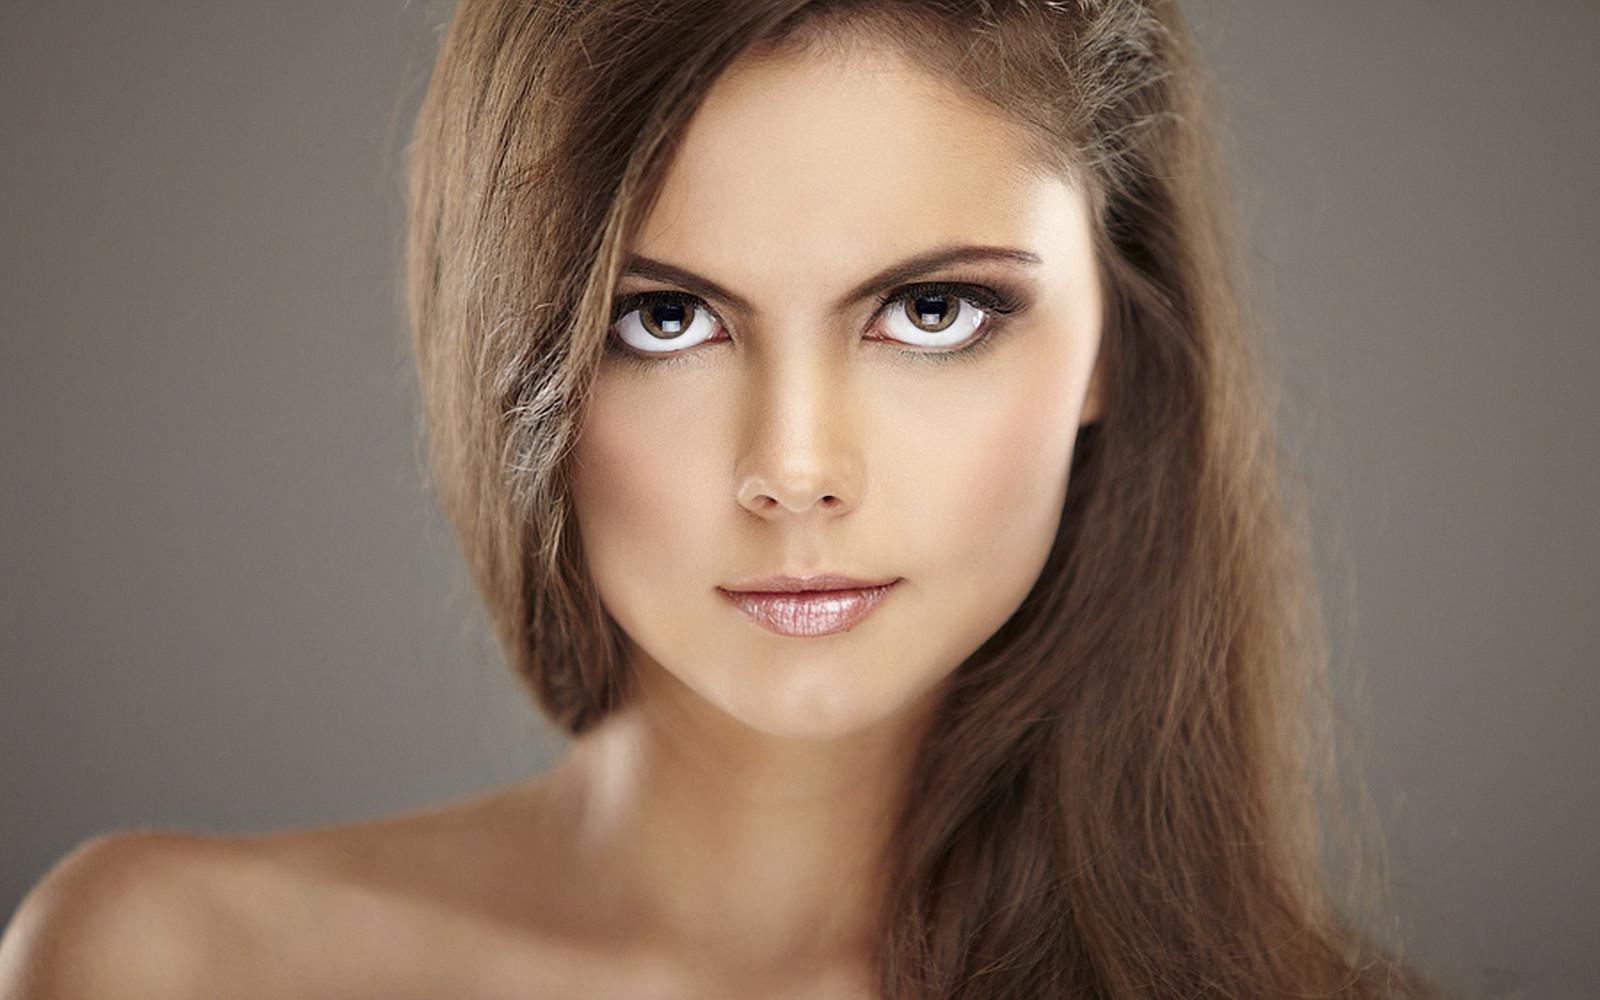 Fotos de caras de mujeres enojadas 30